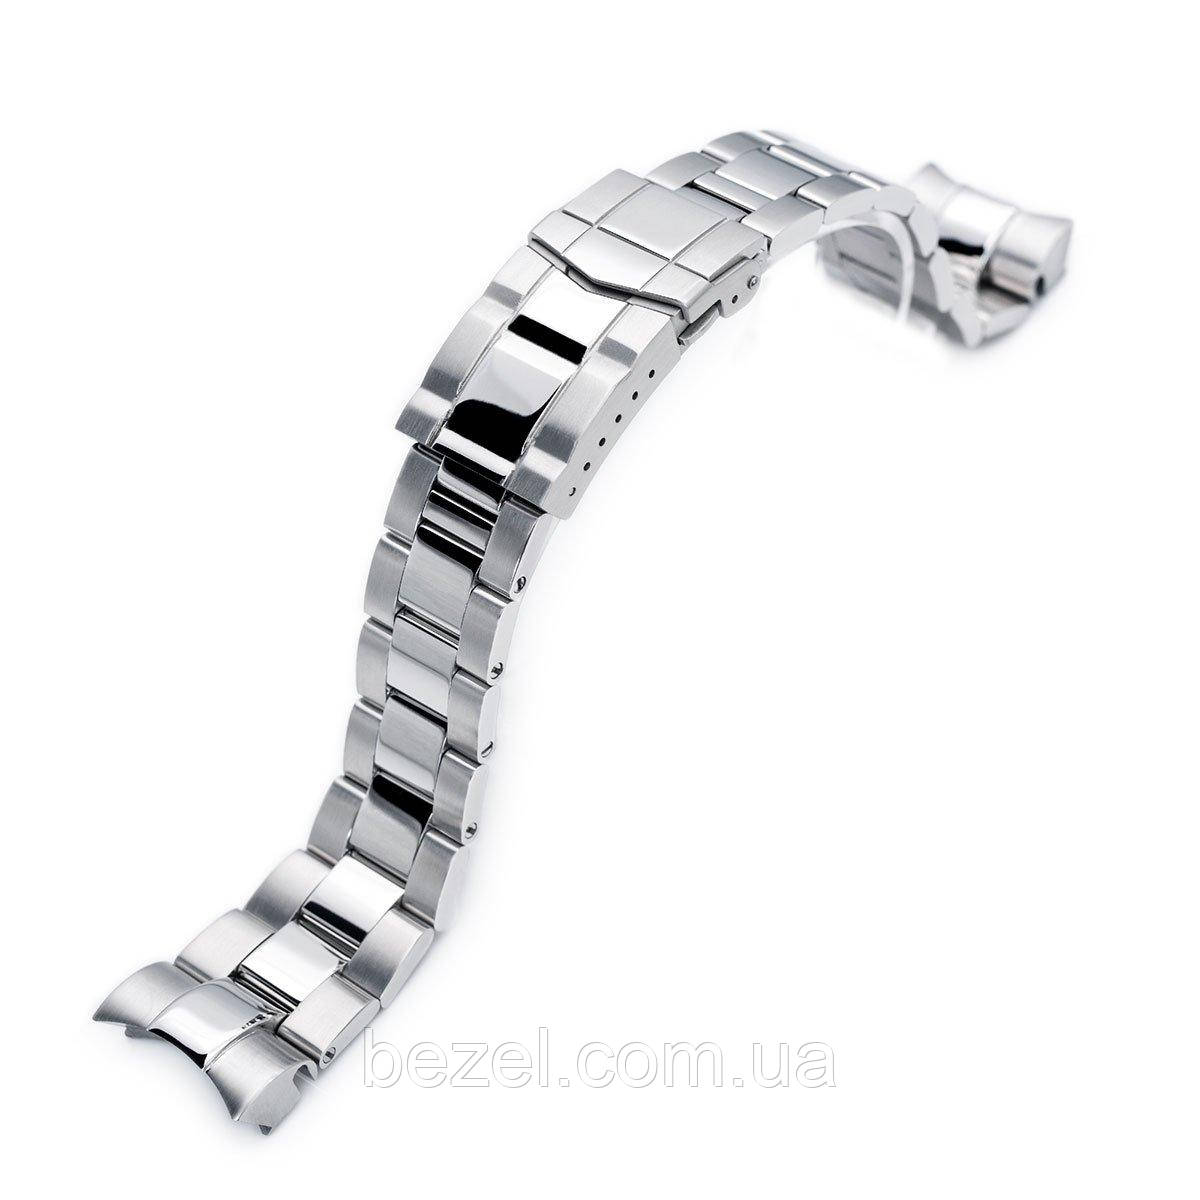 22mm Super 3D Oyster 316L Stainless Steel Watch Bracelet for Tudor Black Bay, Brushed & Polished Submariner Clasp